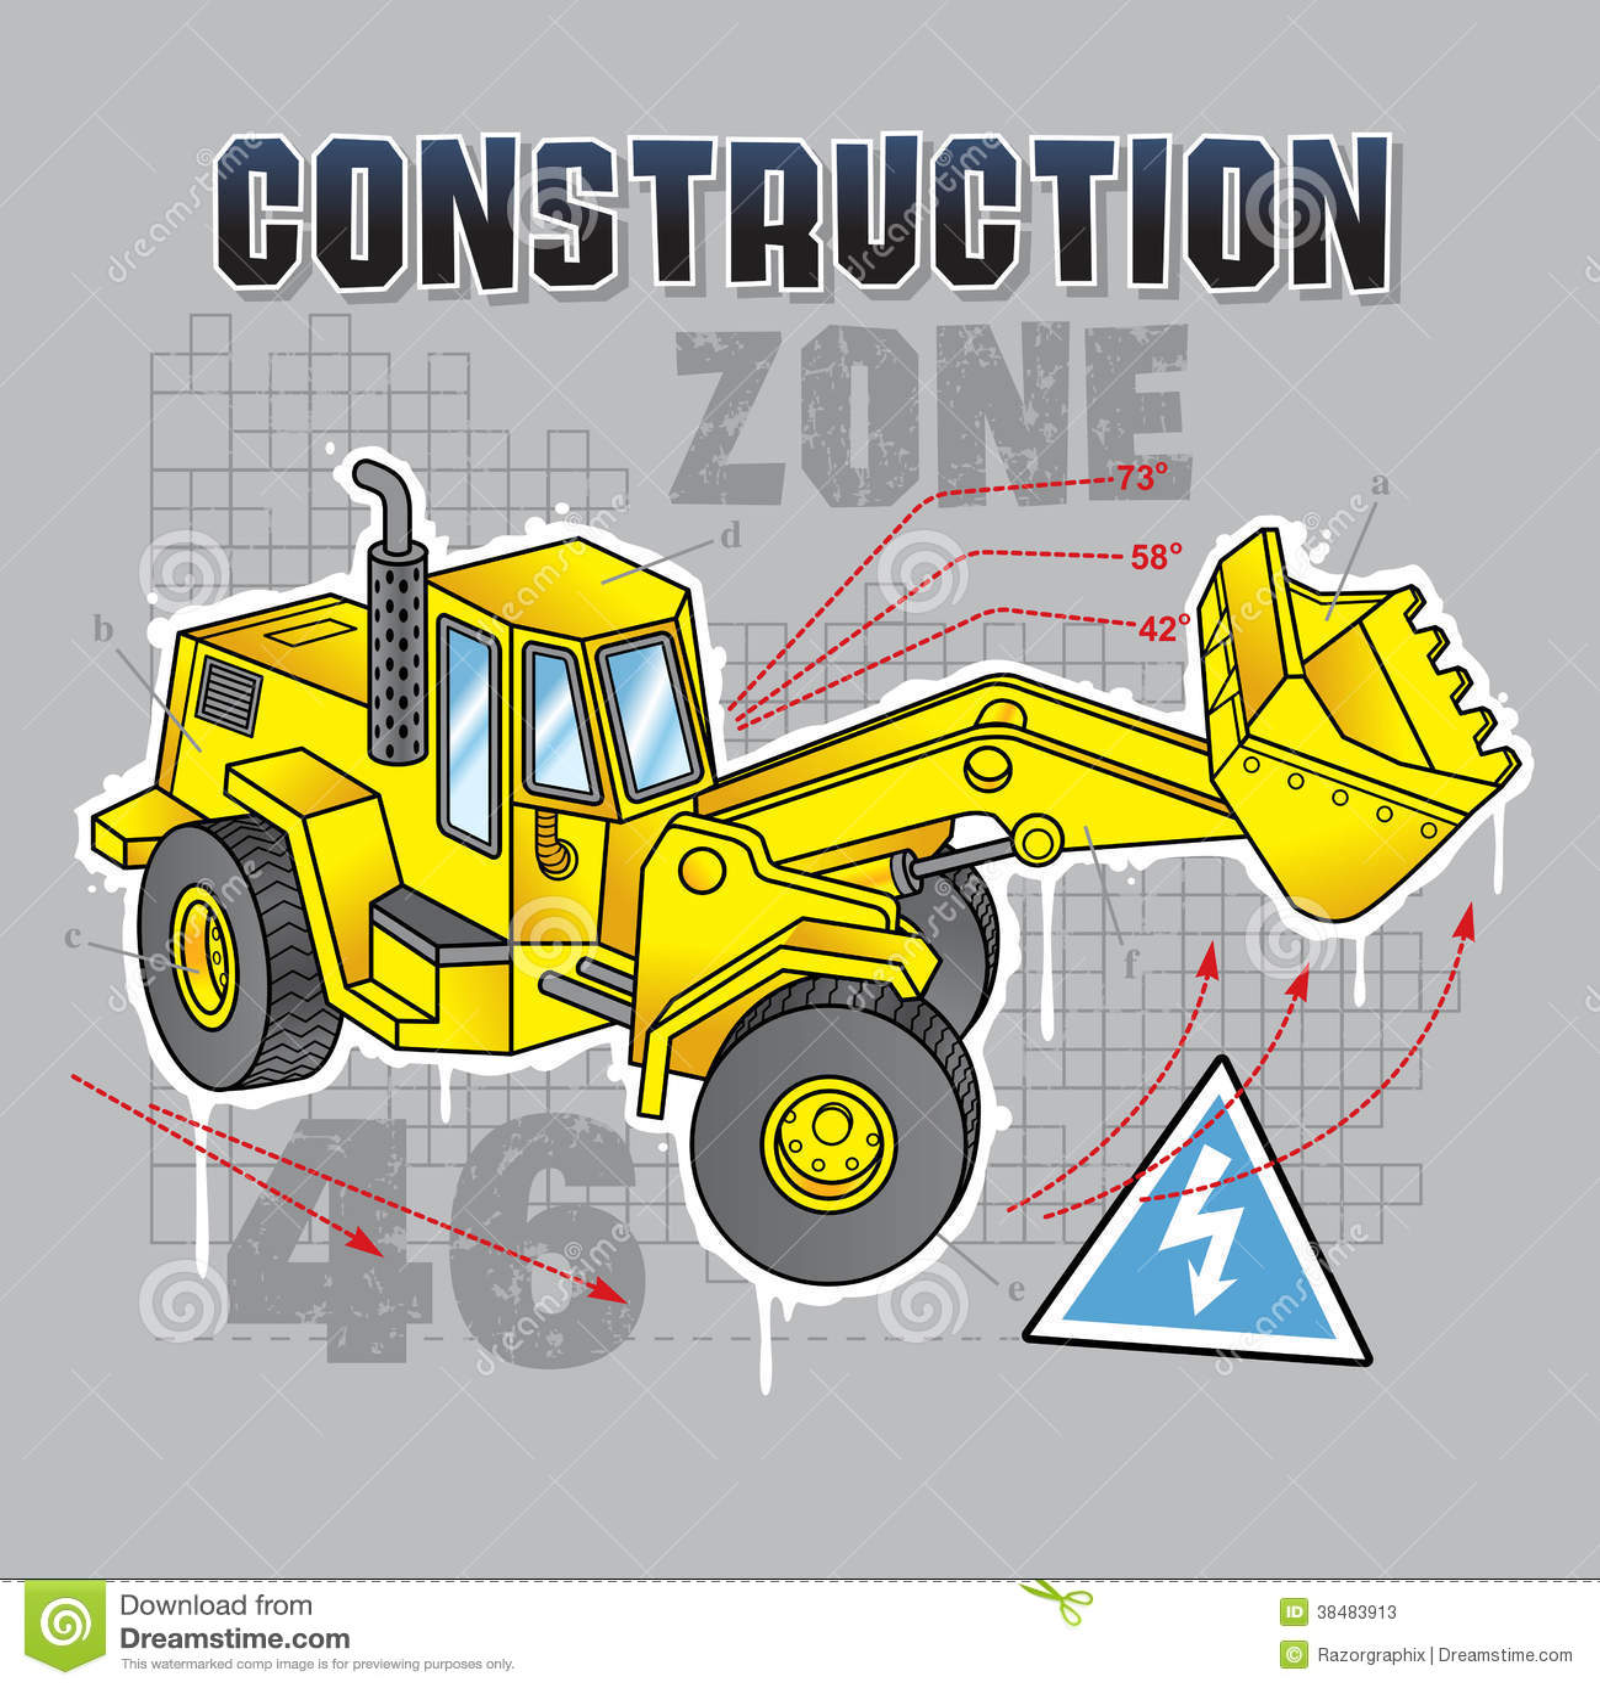 Construction Truck Blueprint Stock Vector - Illustration of